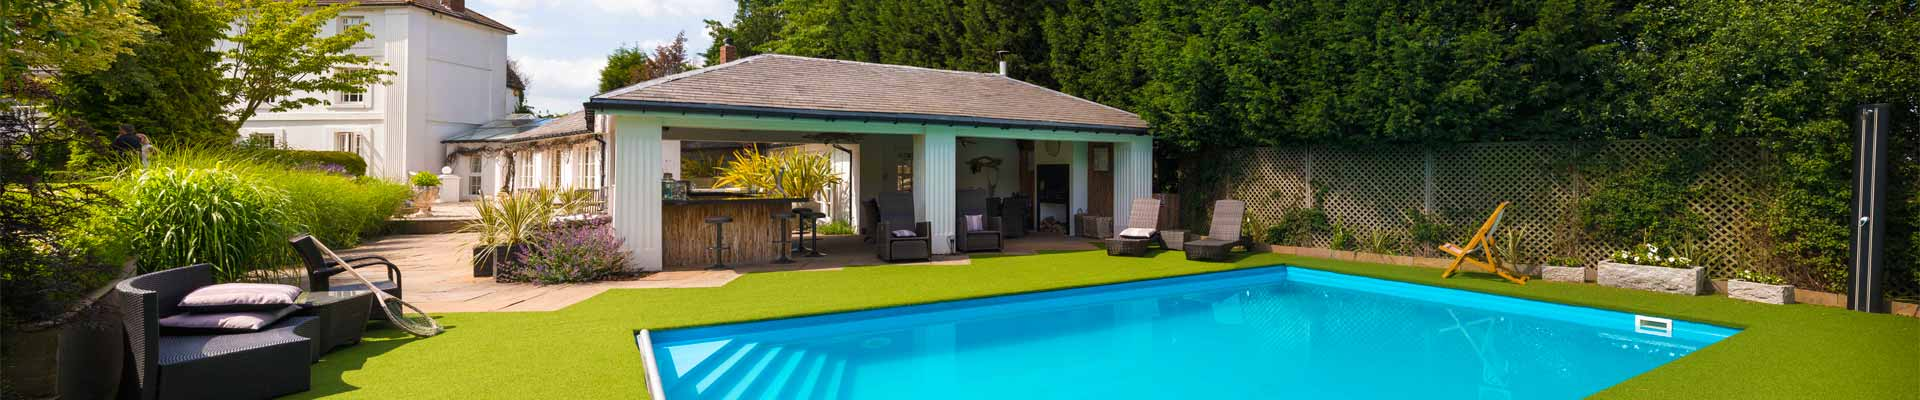 Photo of High House' stunning swimming pool